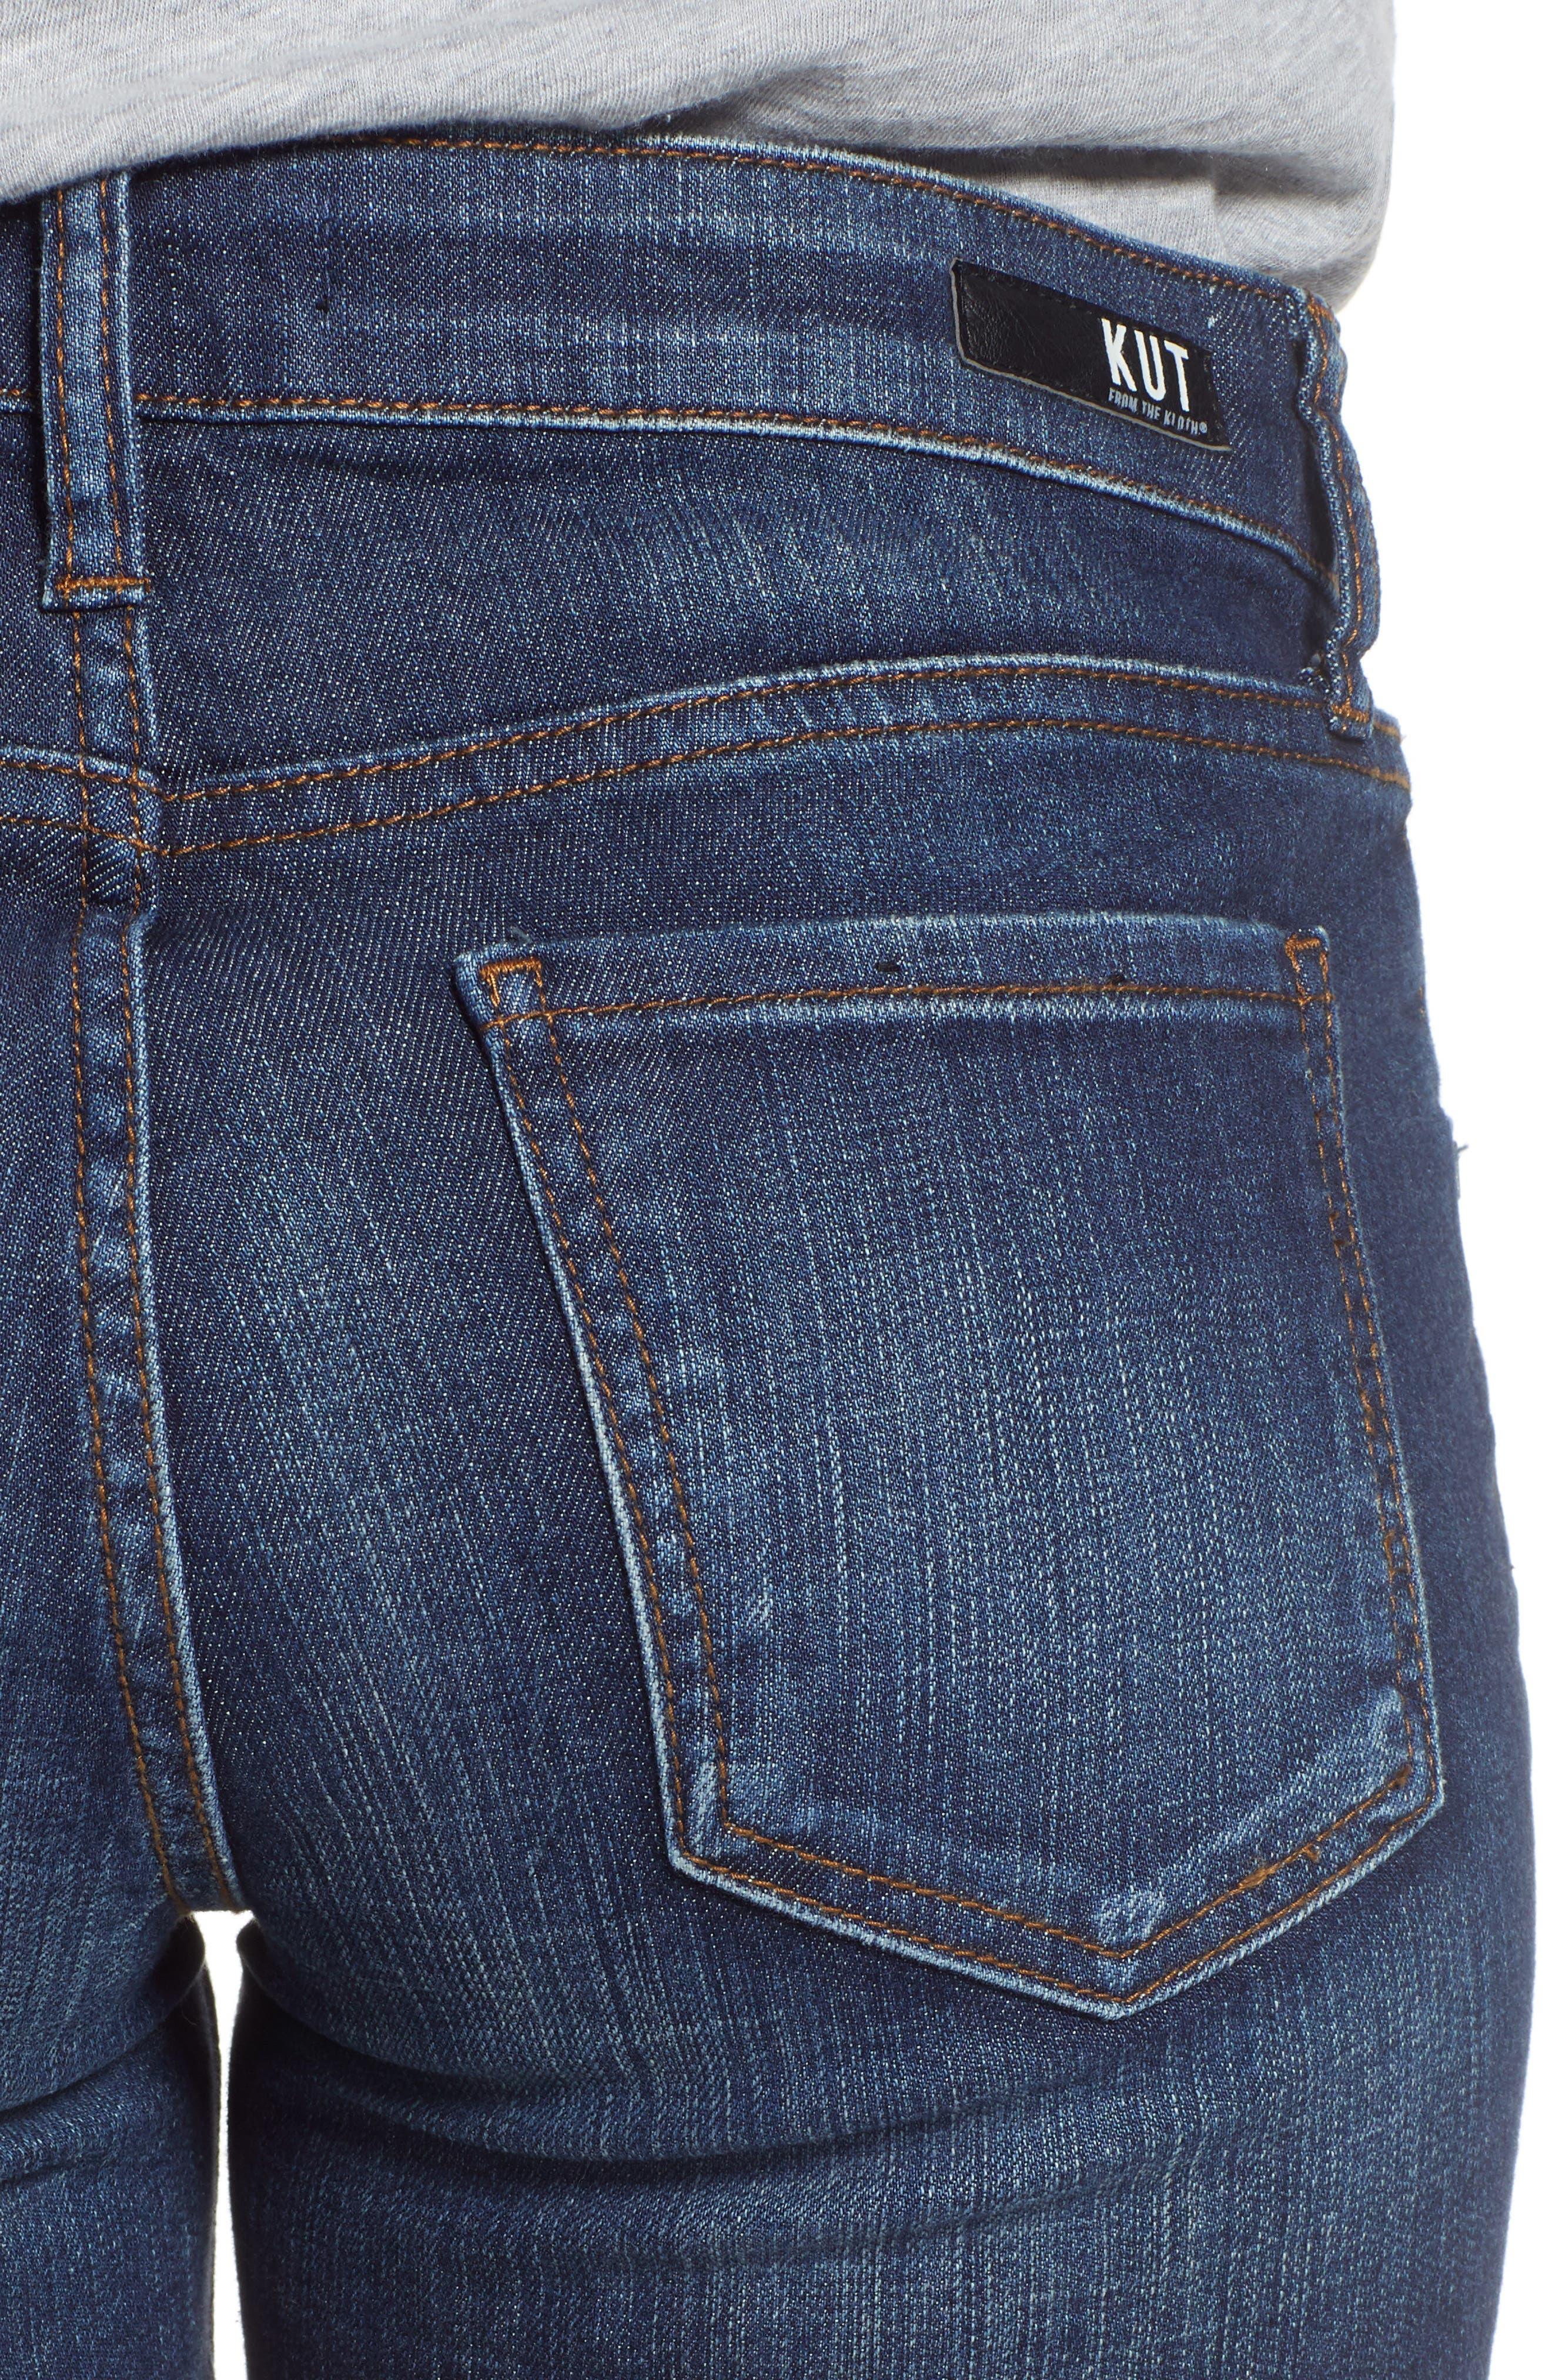 KUT Kollection Gidget Cutoff Denim Shorts,                             Alternate thumbnail 4, color,                             400